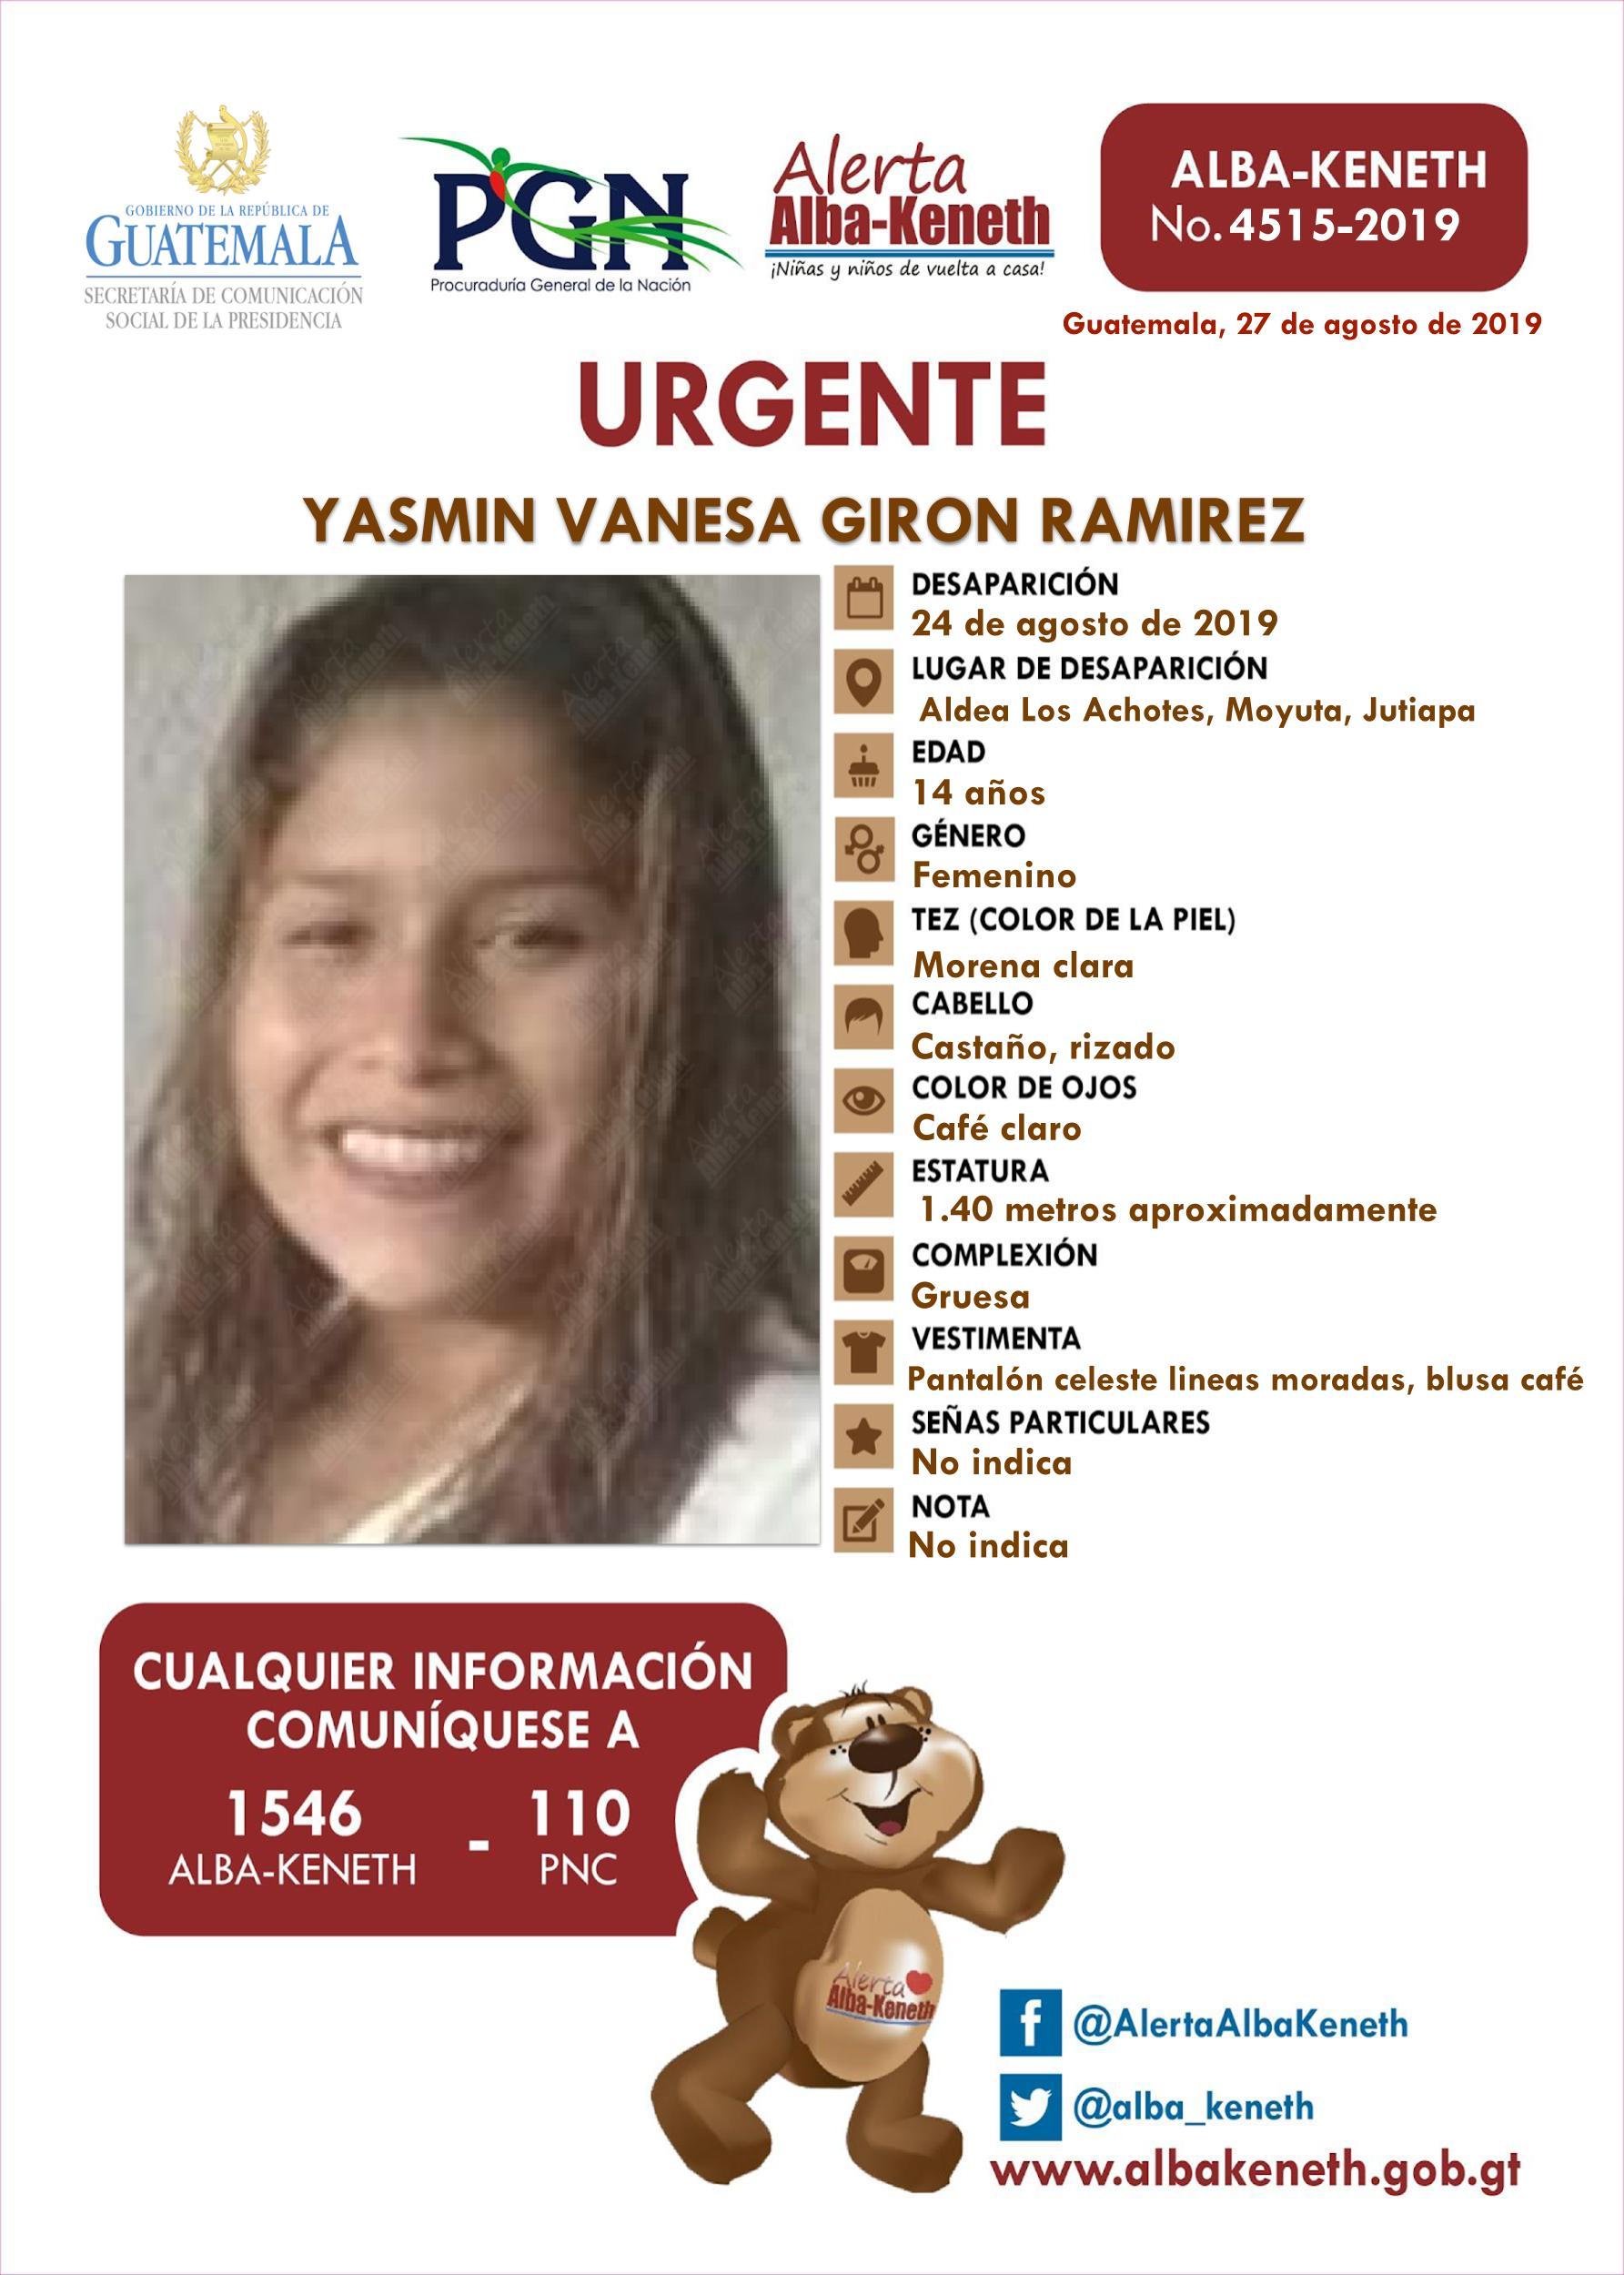 Yasmin Vanesa Giron Ramirez